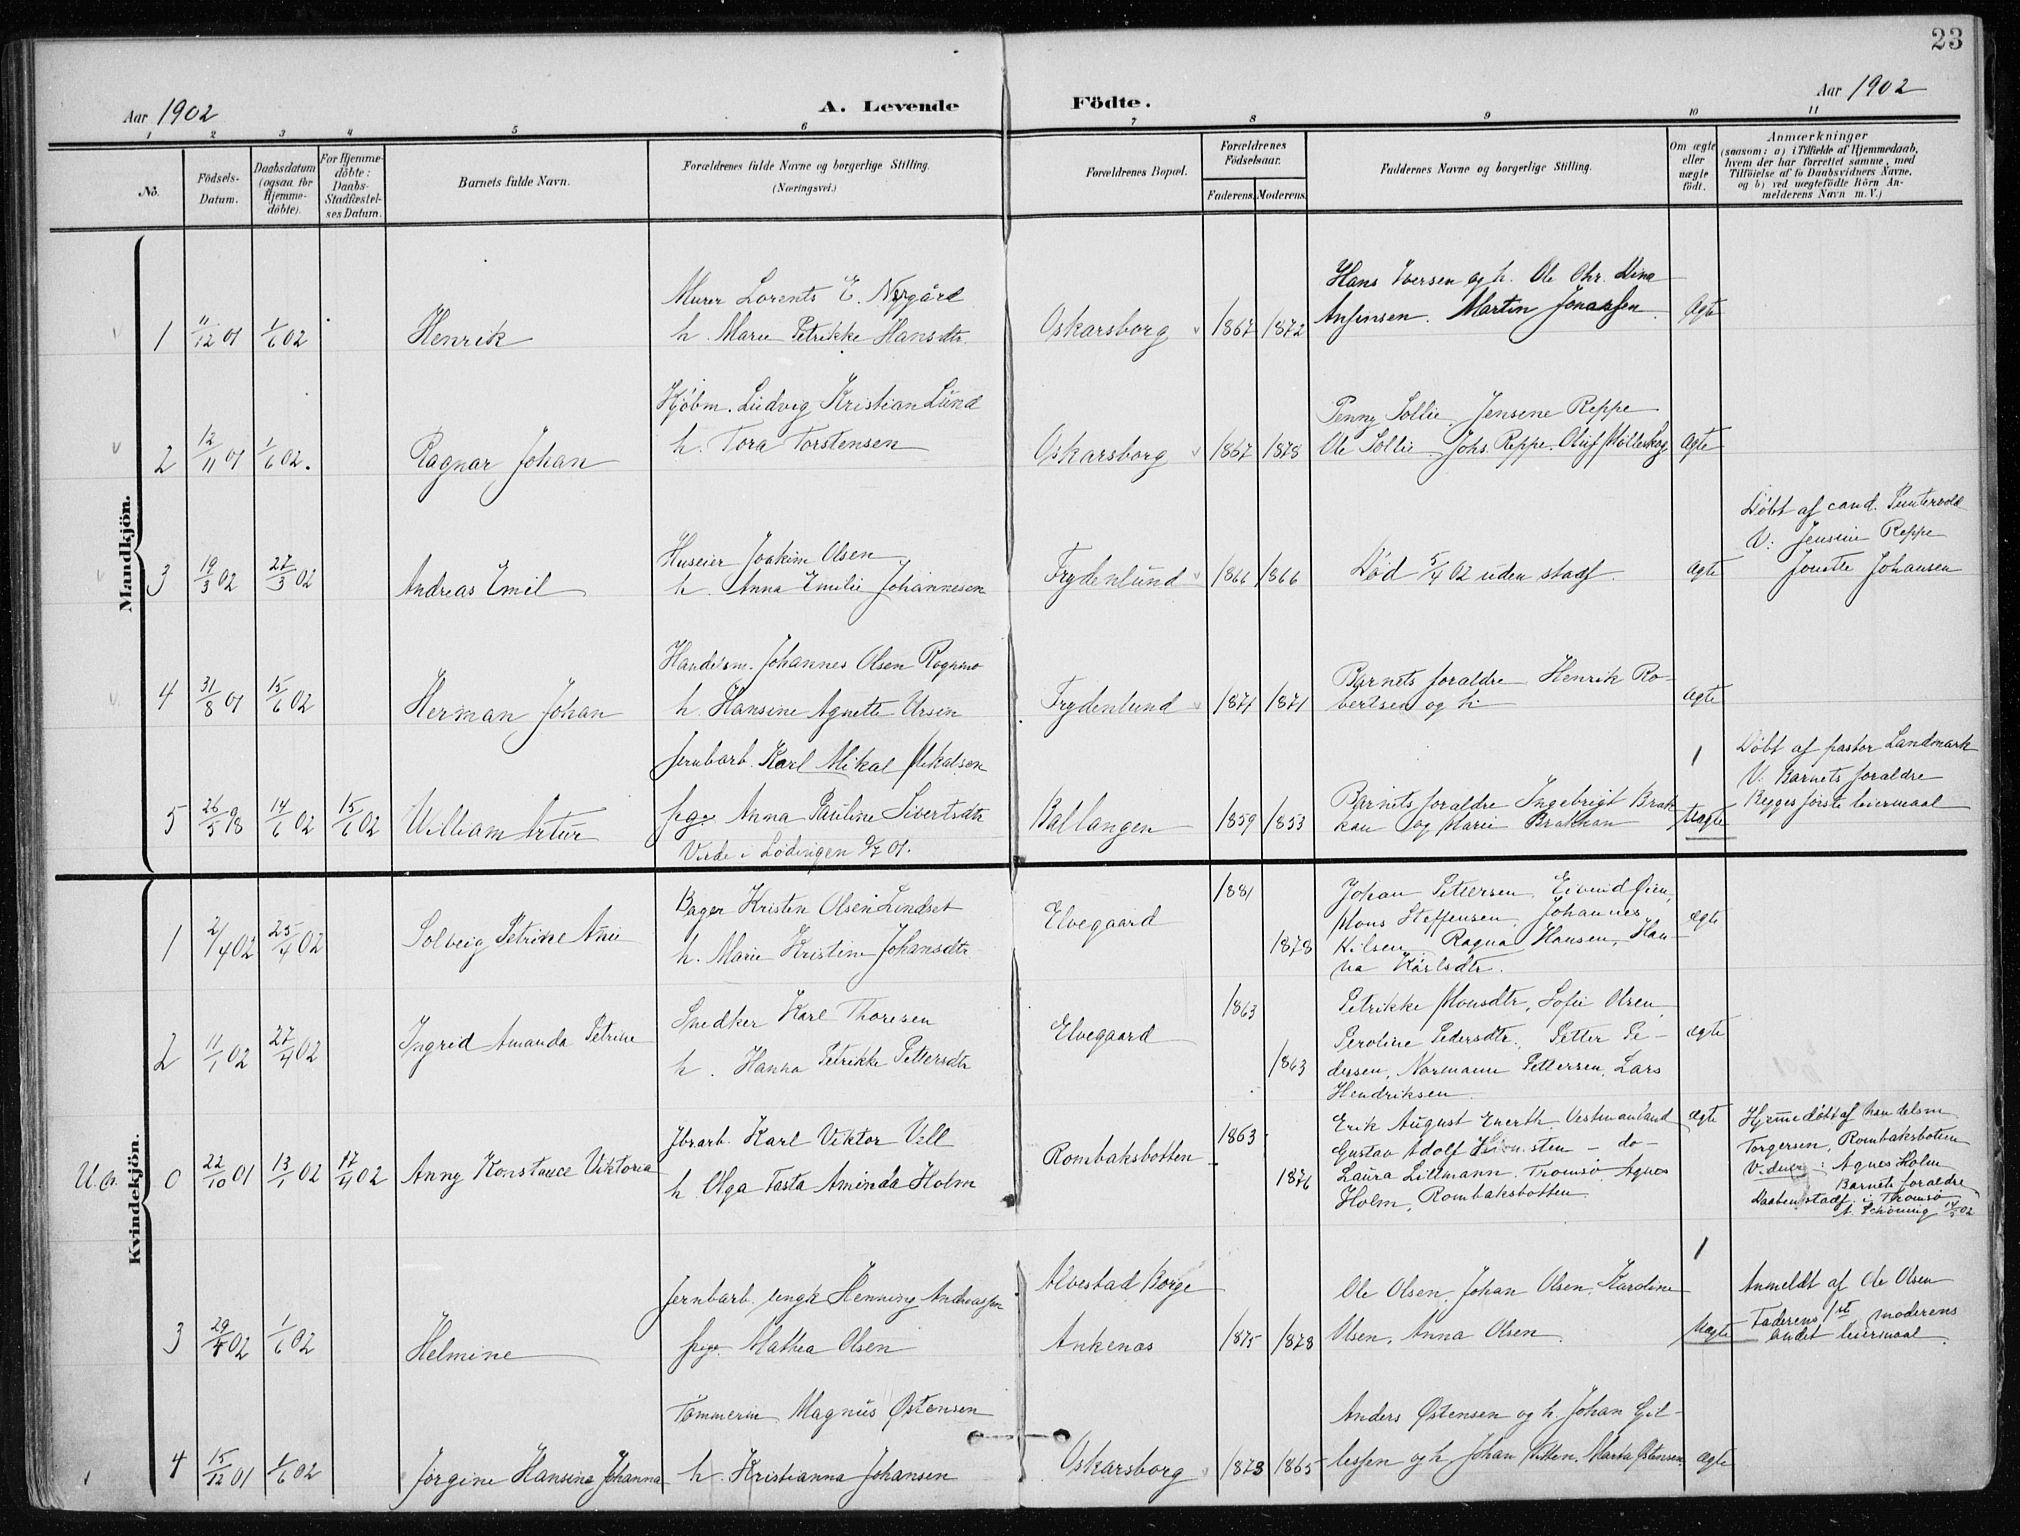 SAT, Ministerialprotokoller, klokkerbøker og fødselsregistre - Nordland, 866/L0941: Ministerialbok nr. 866A04, 1901-1917, s. 23